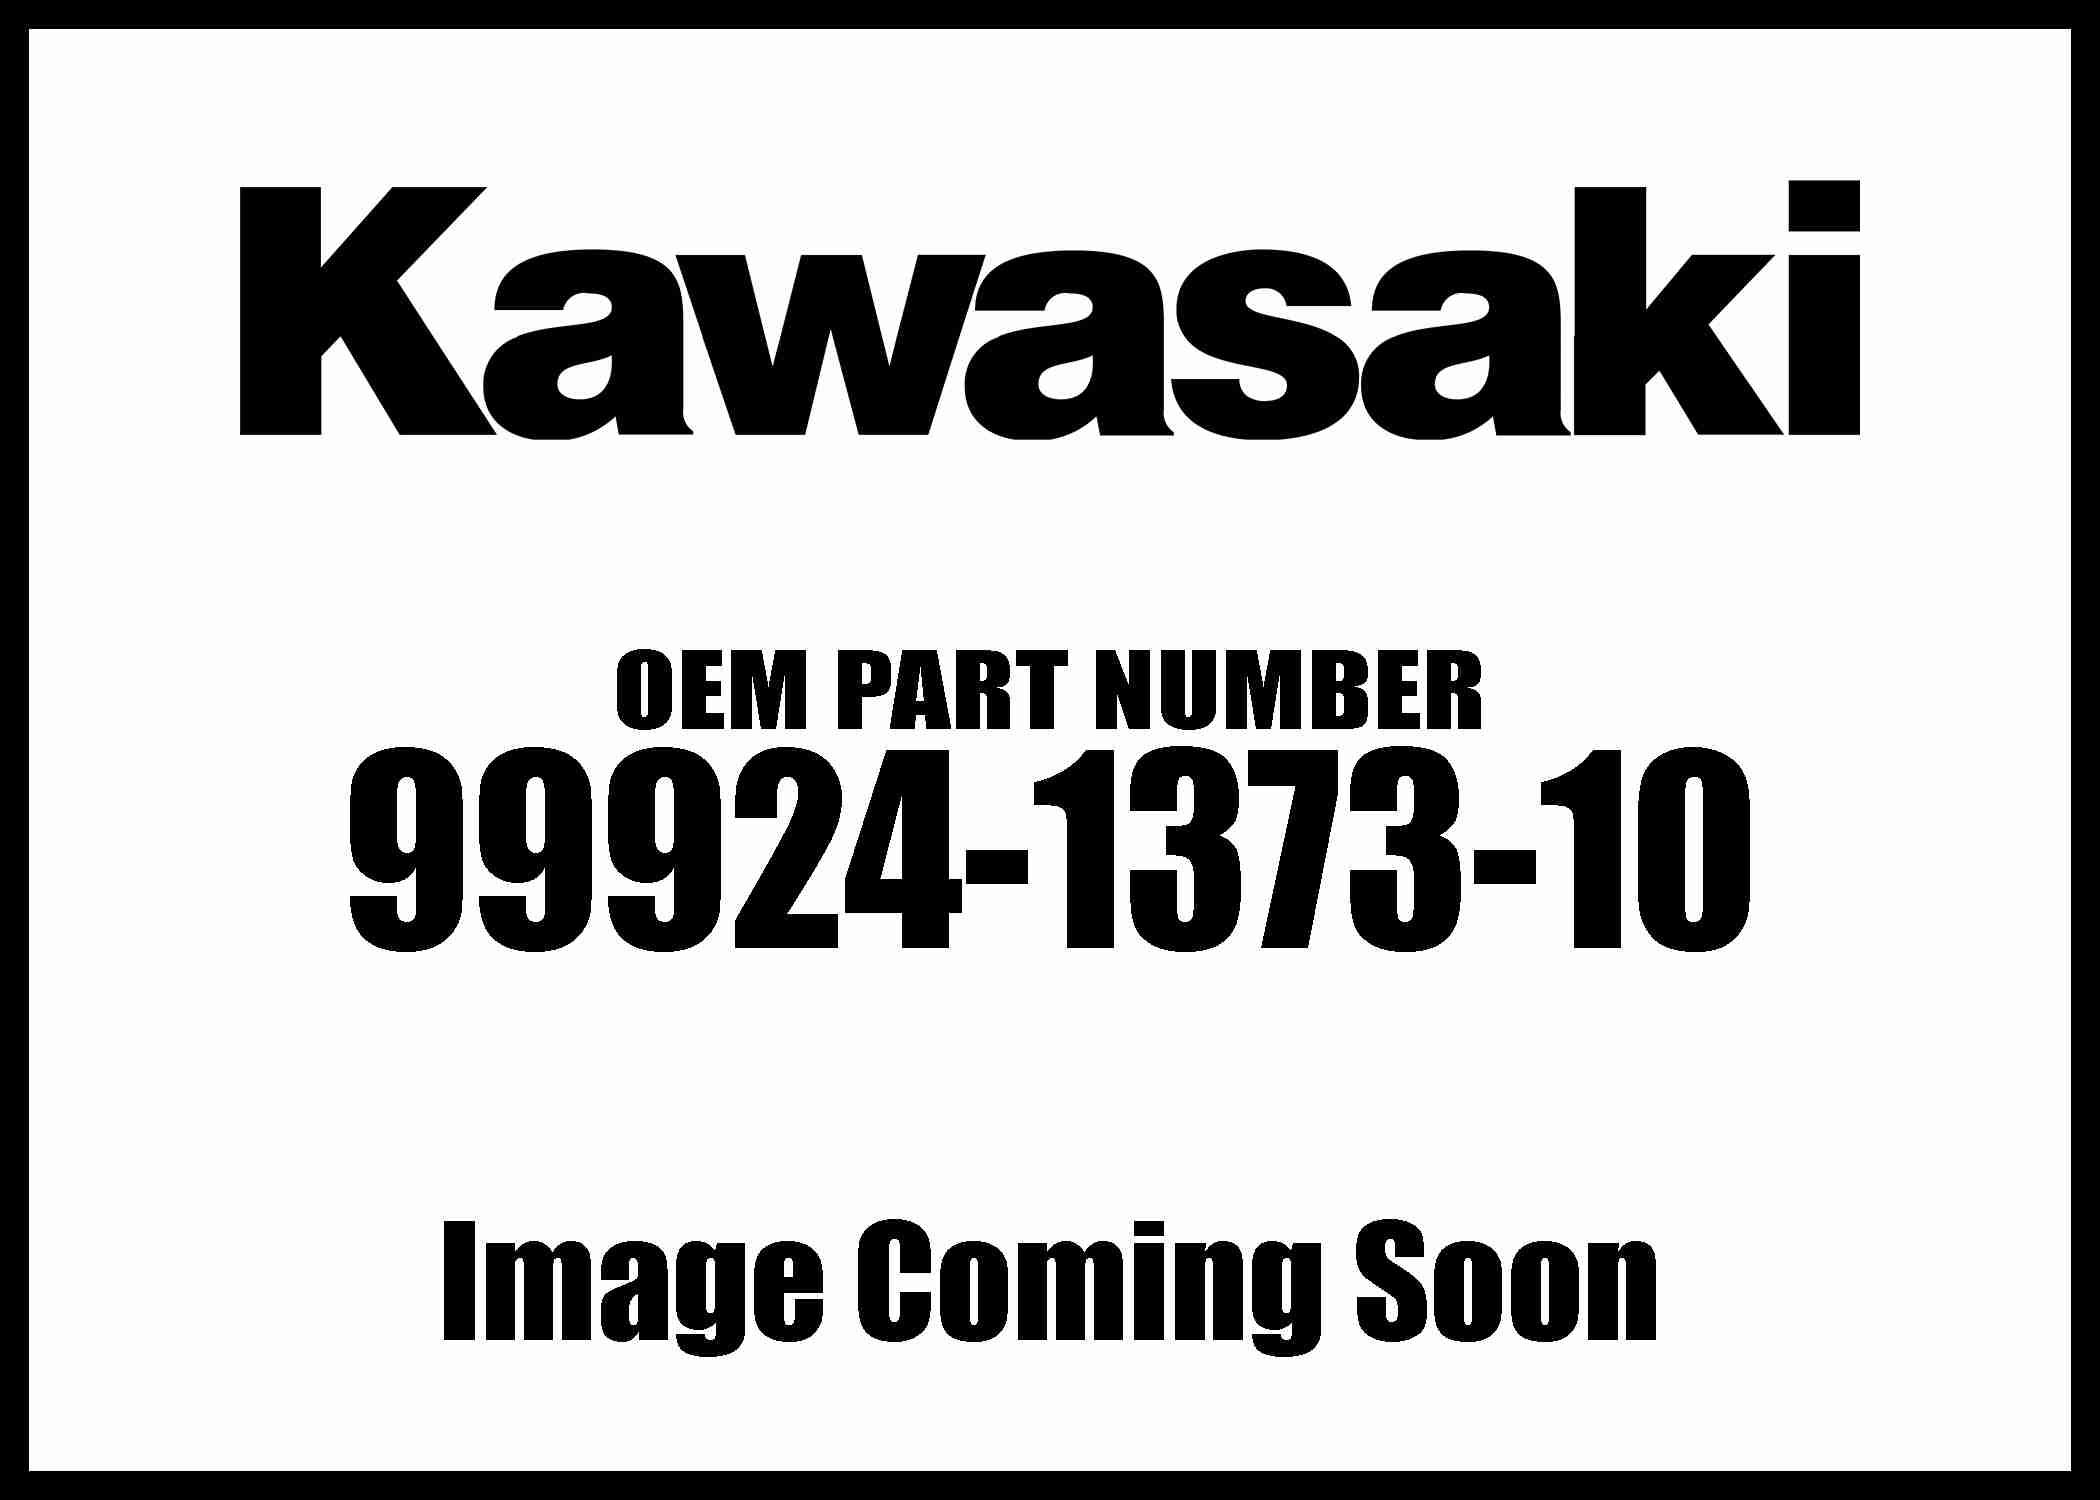 Kawasaki 2007-2016 Vulcan S/M Vn900c 99924-1373-10 New OEM